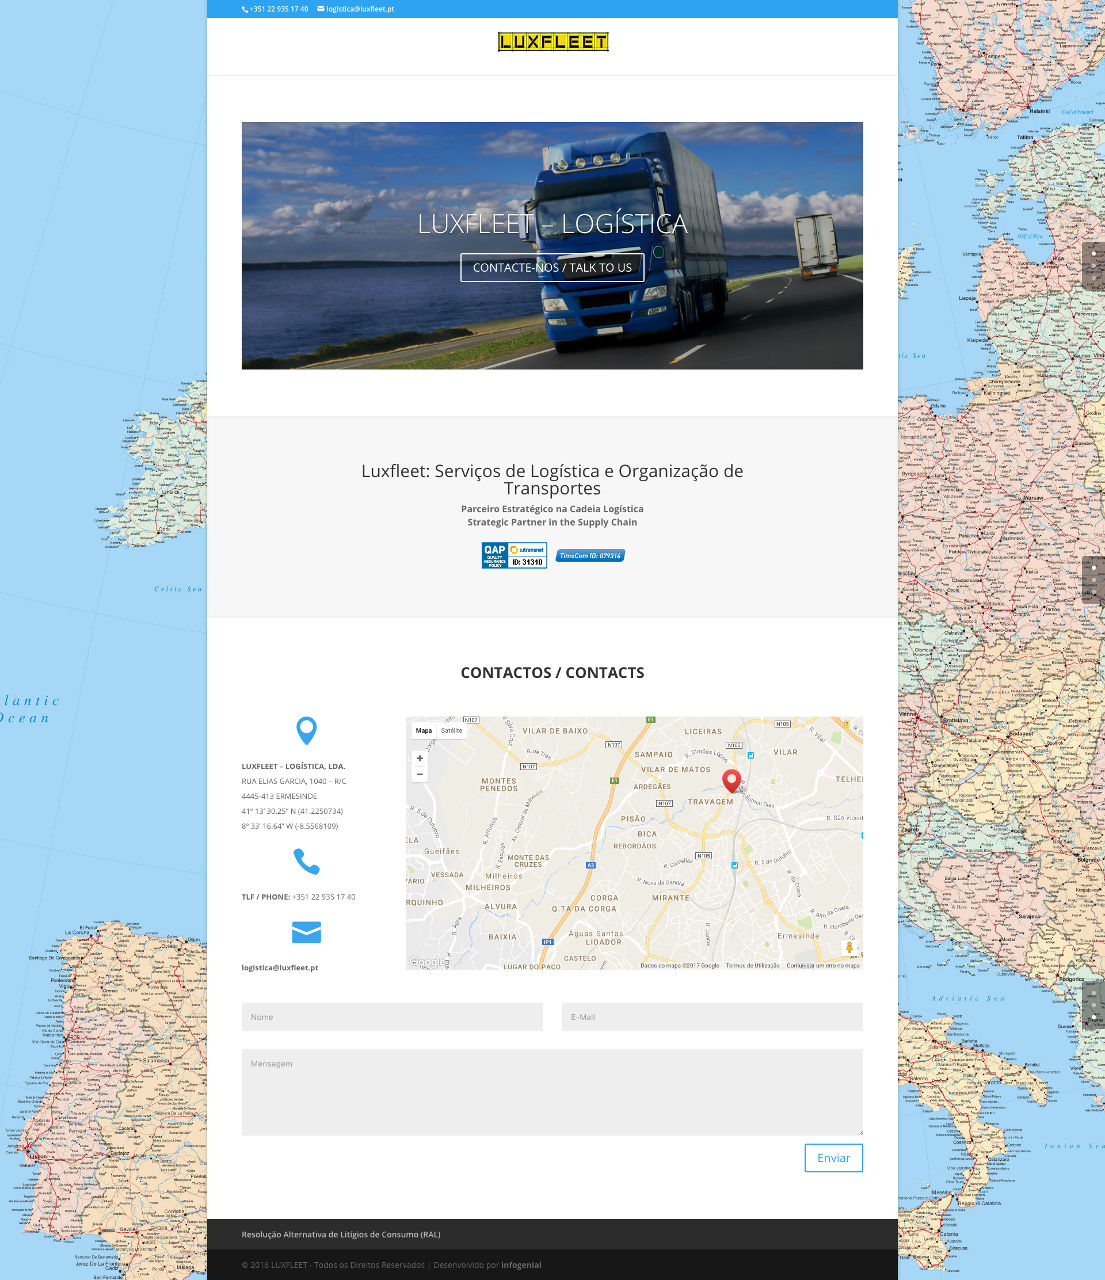 luxfleet servicos de logistica e organizacao de transportes